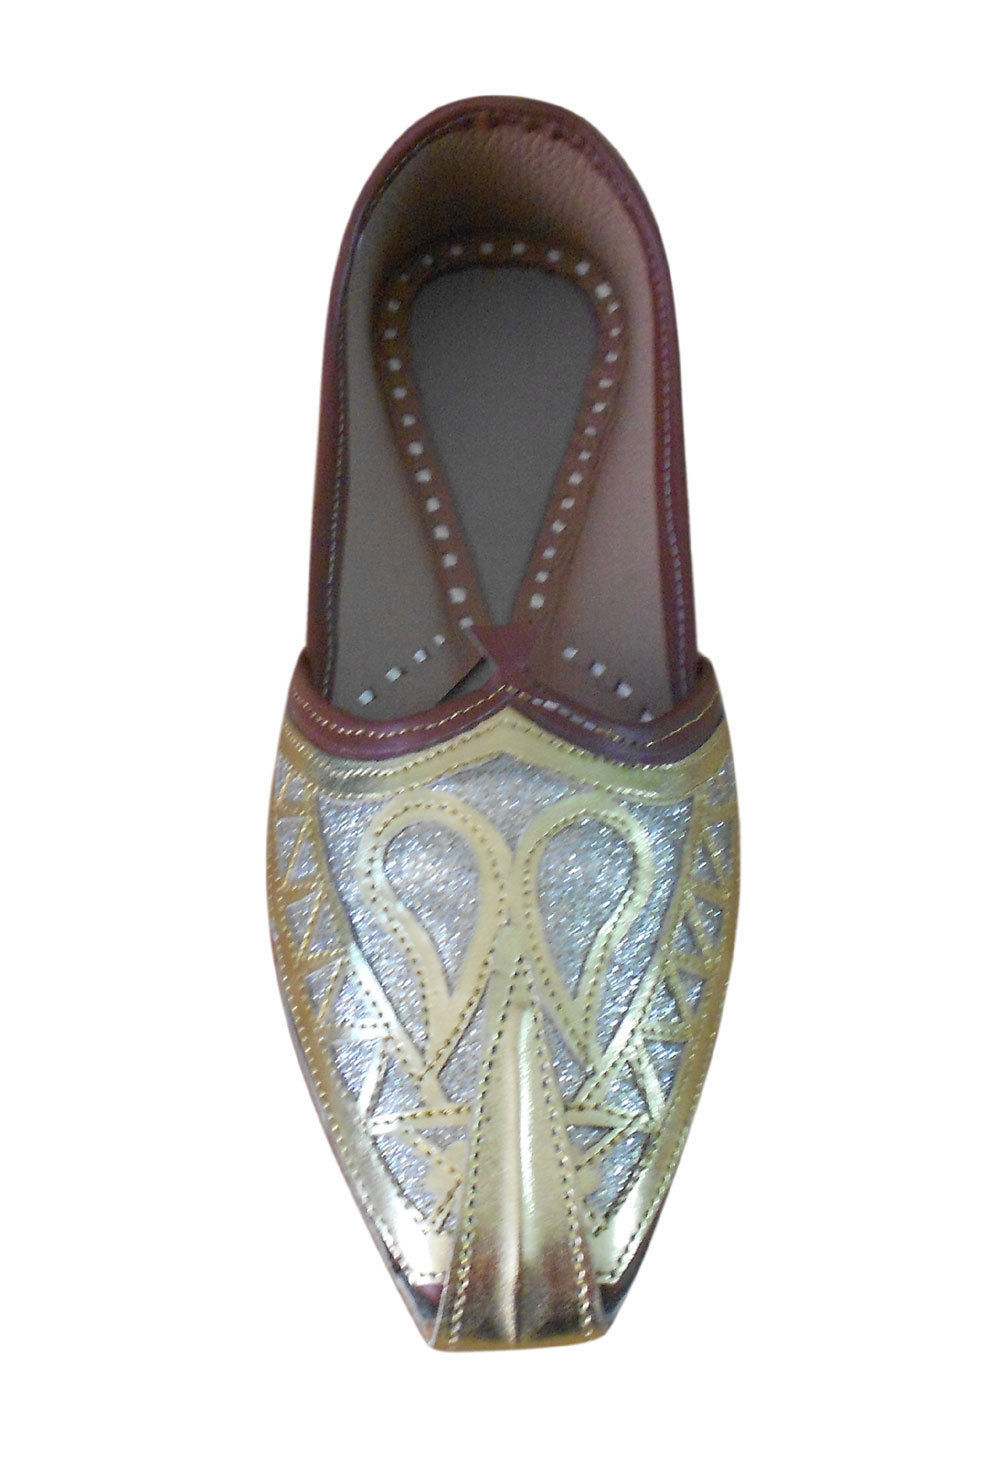 0312d5472822c Us 7-10 Indian Handmade Designer Men Shoes and 50 similar items. 57